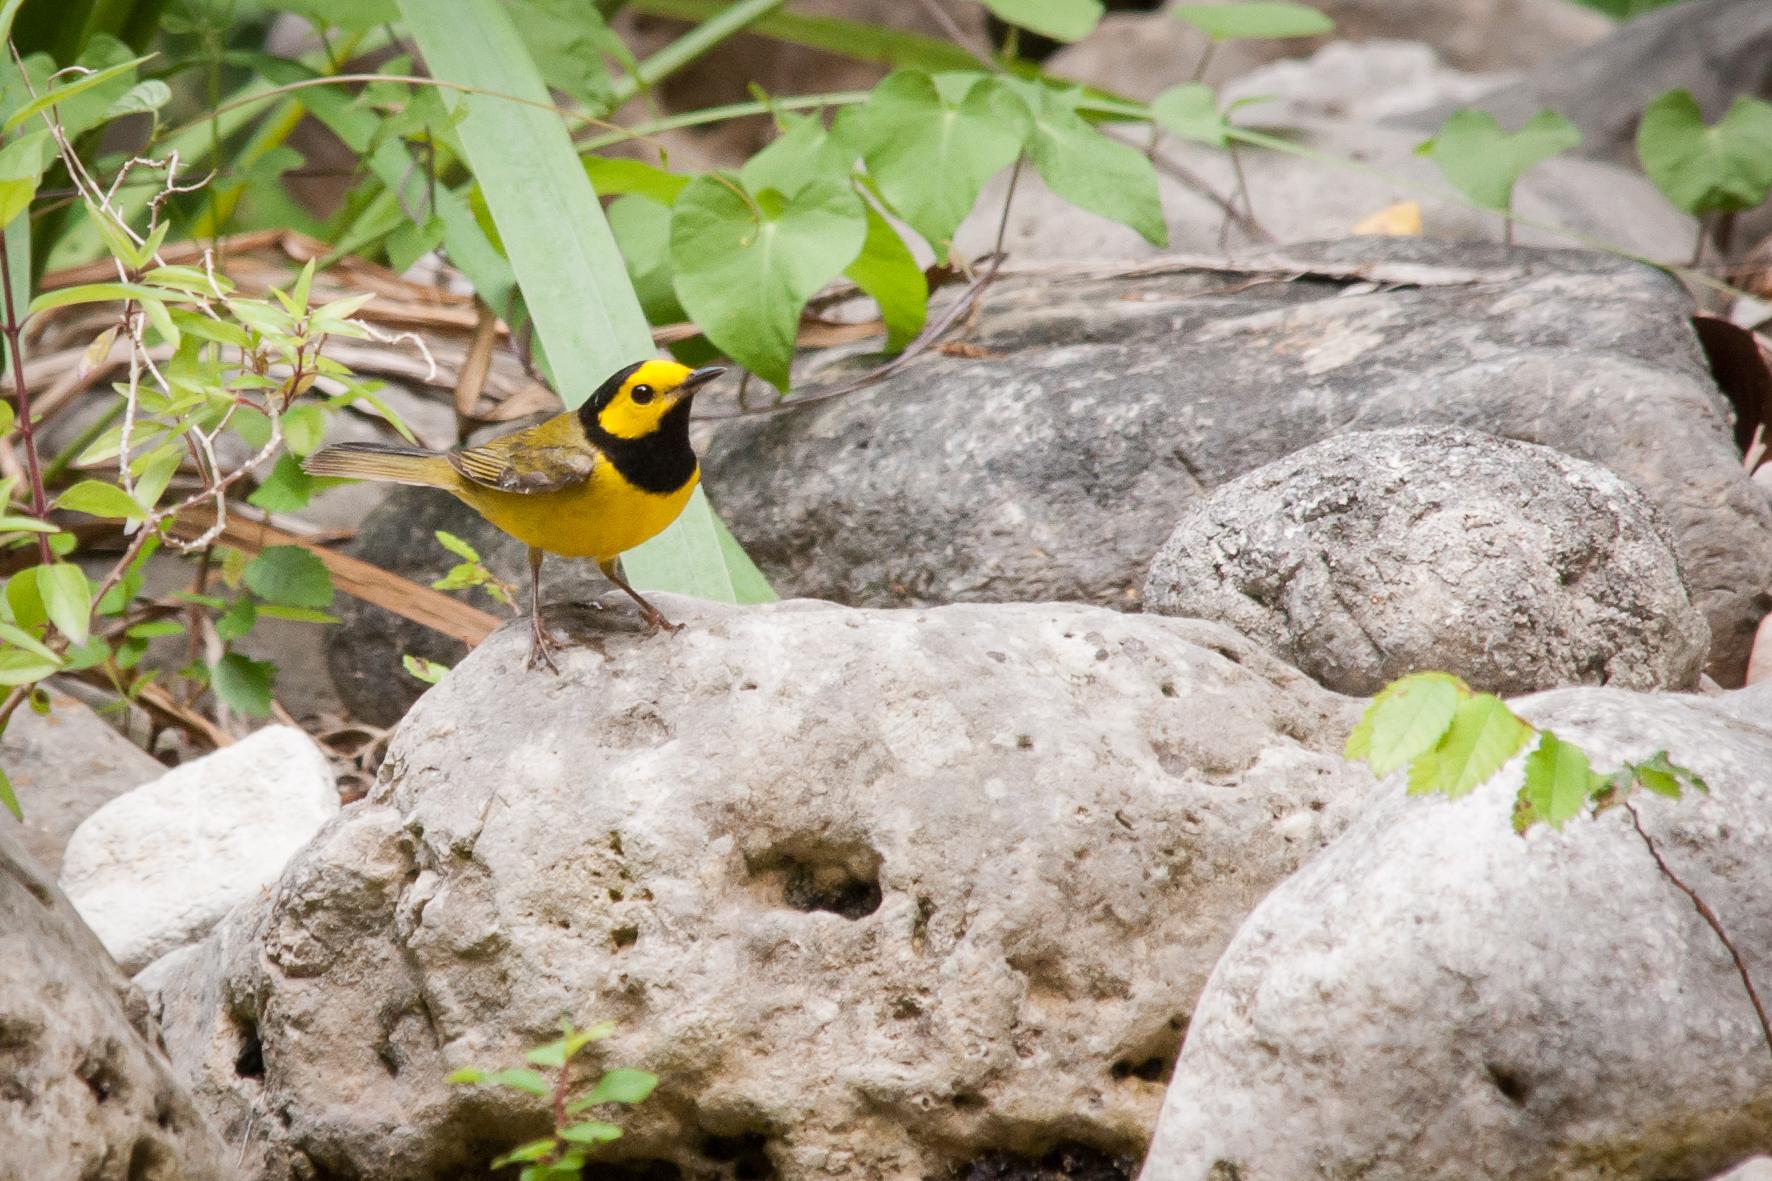 Species: Hooded Warbler Photo Credit: Alyssia Church Date: April 2017 Location: Warbler Woods Bird Sanctuary